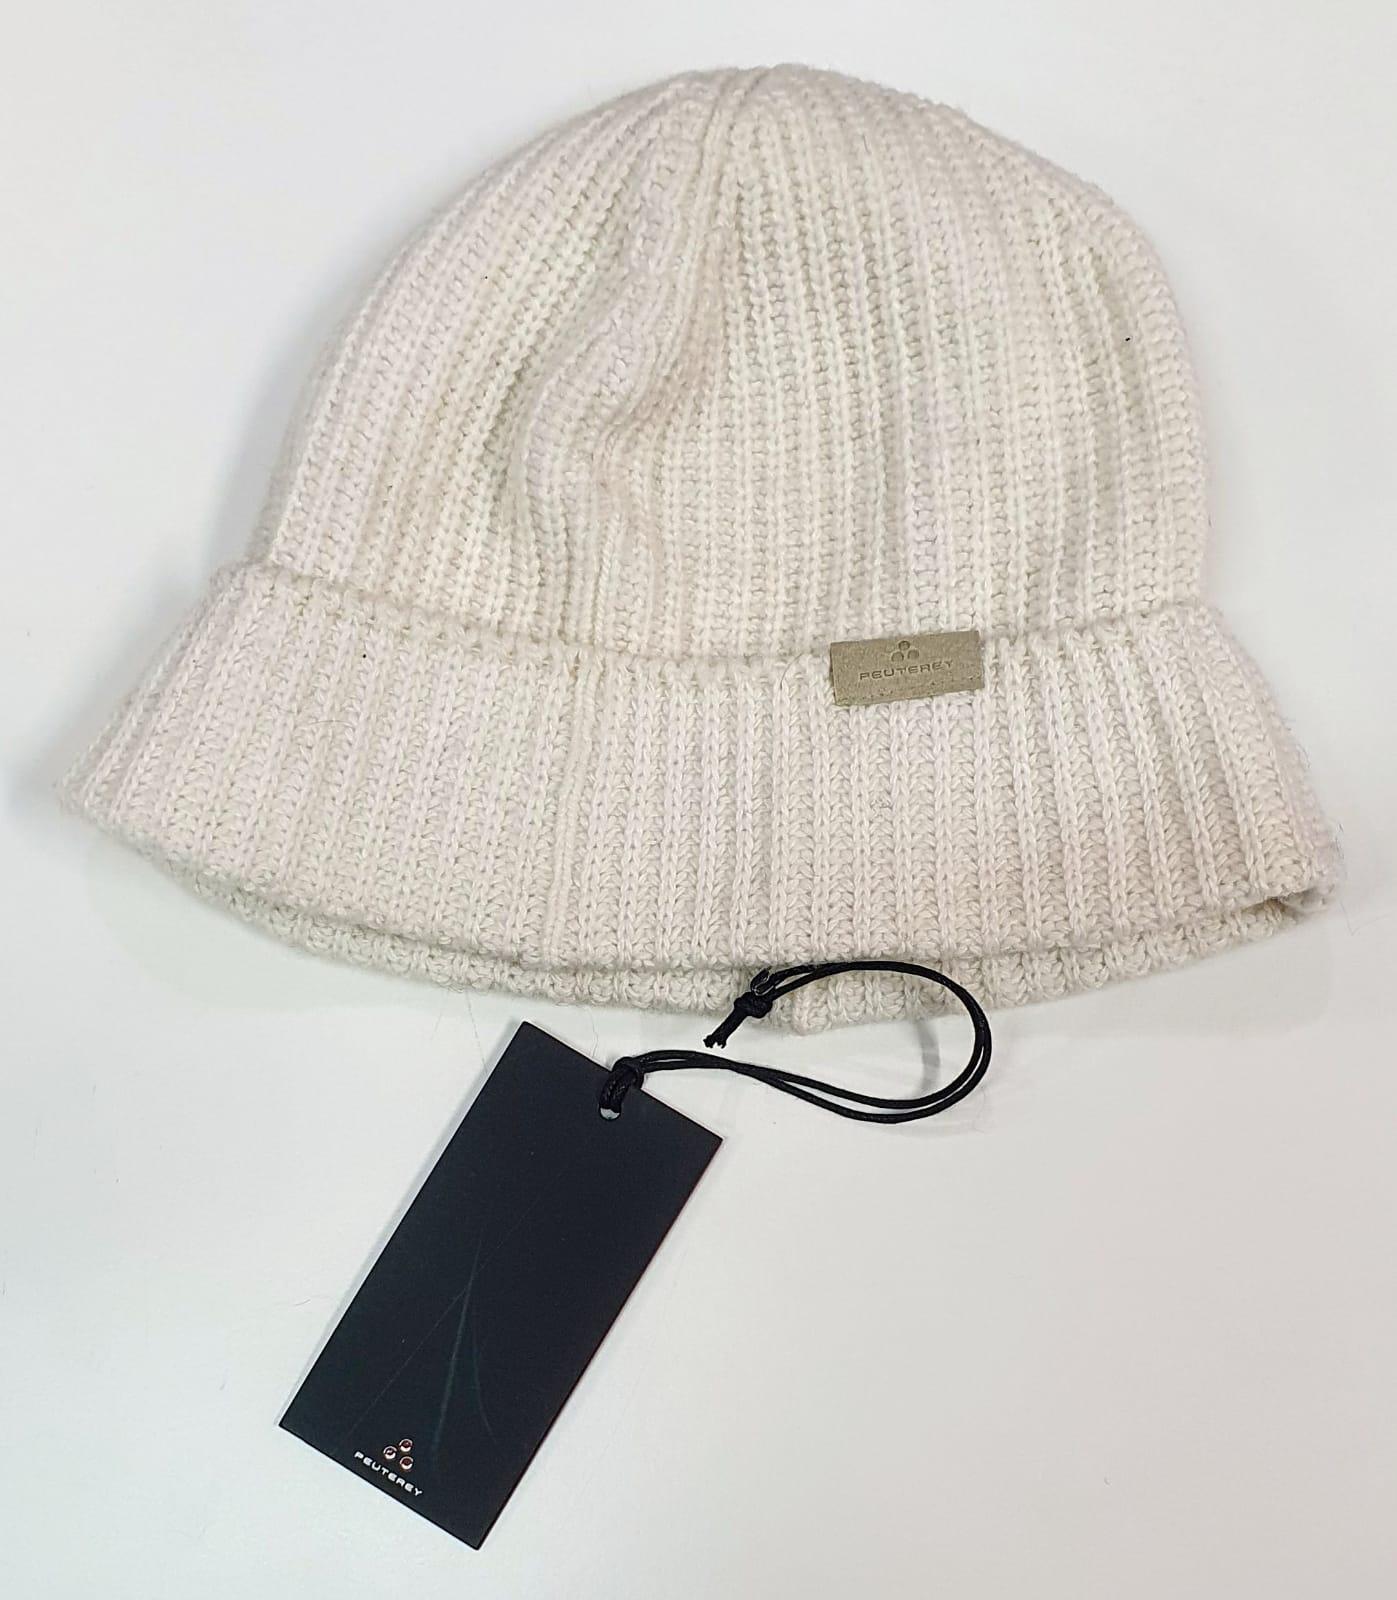 Puterey cappello bianco